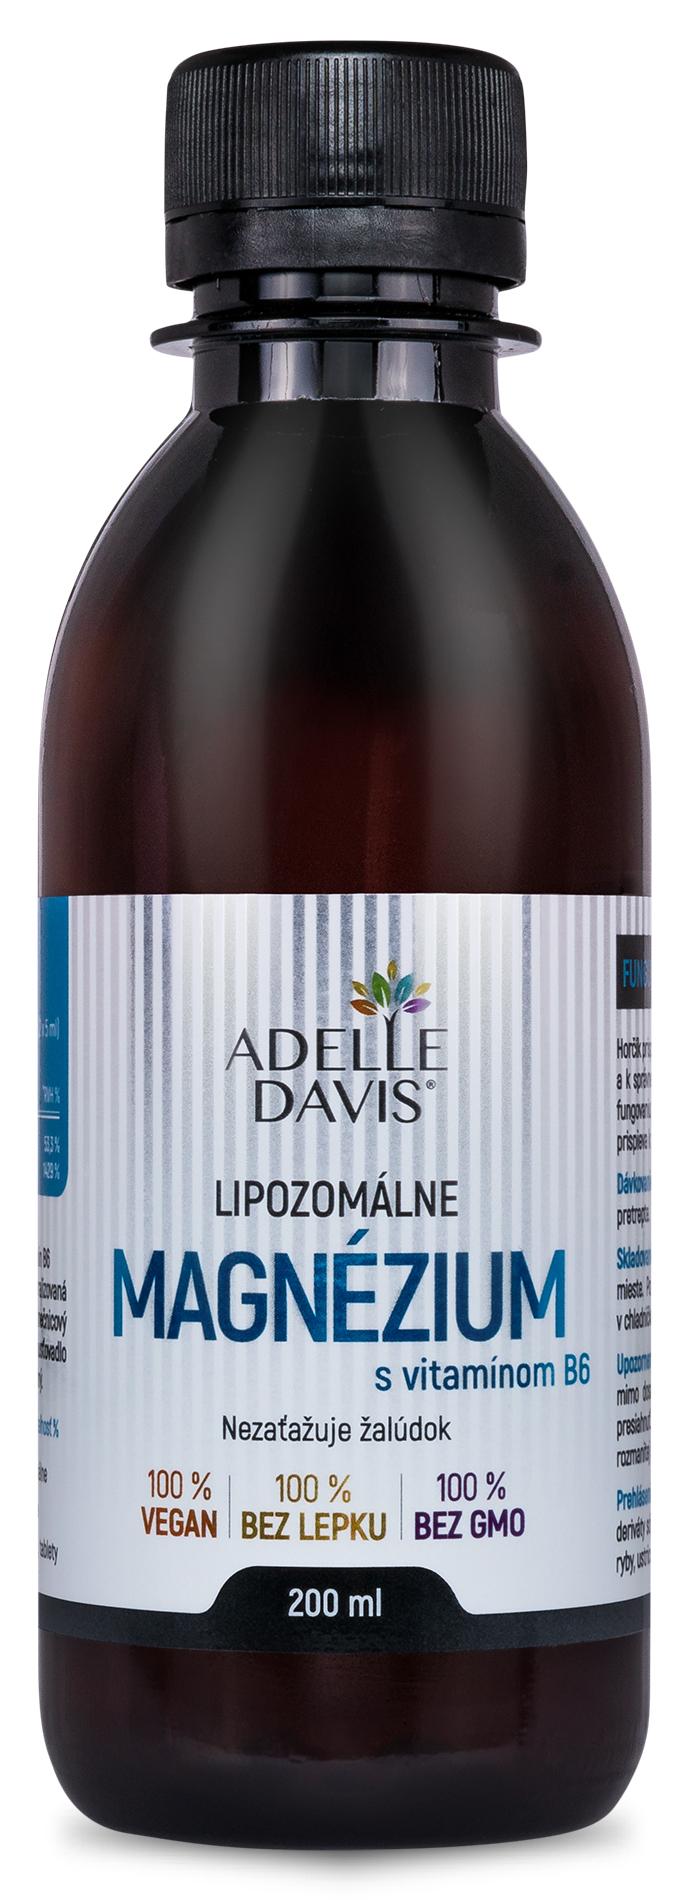 Adelle Davis - Lipozomálne magnézium s vitamínom B6, 200 ml